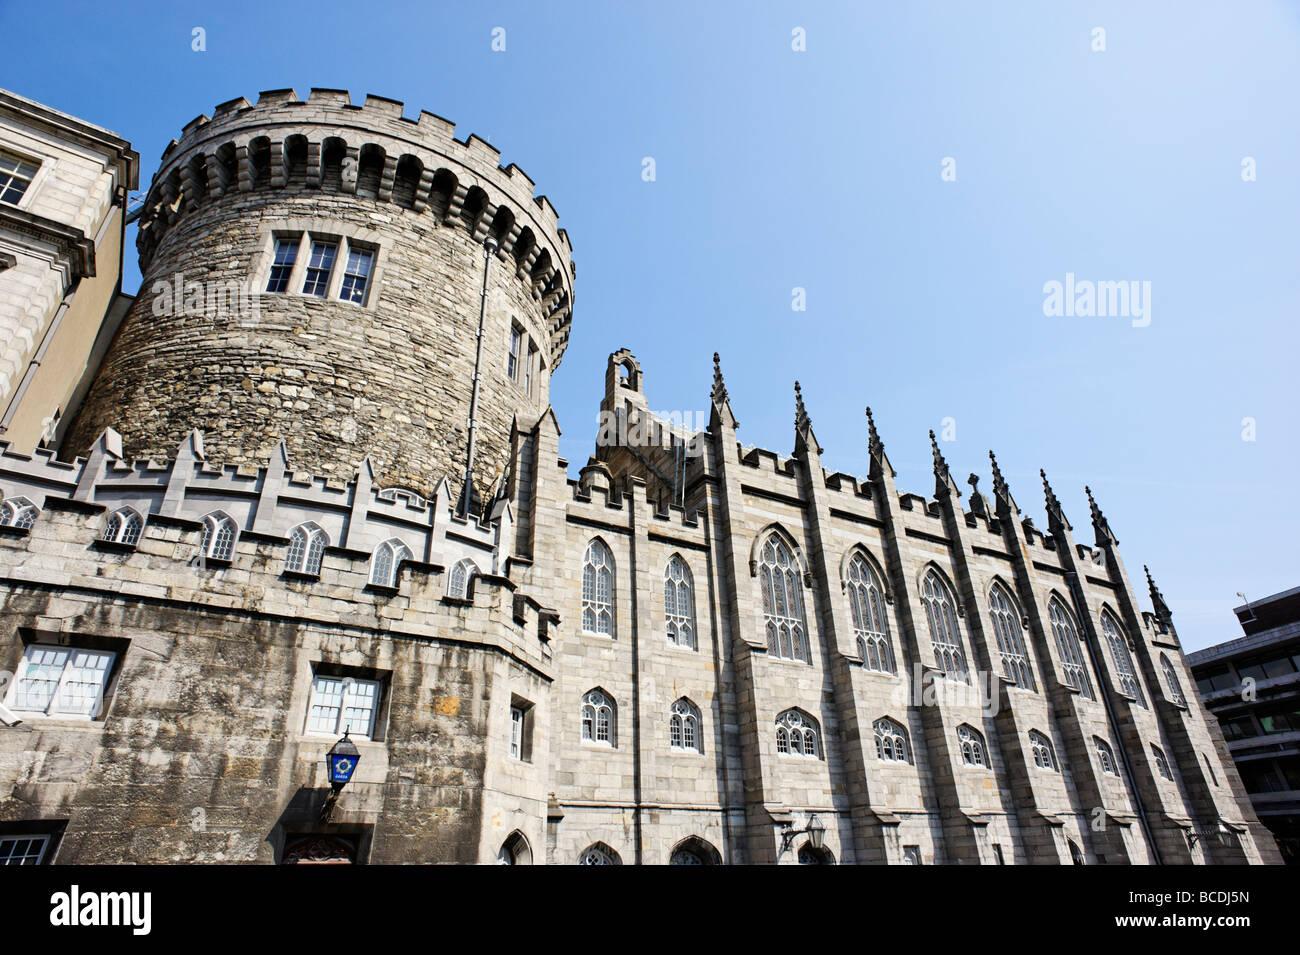 Record Tower and Chapel Royal at Dublin Castle Dublin Republic of Ireland - Stock Image